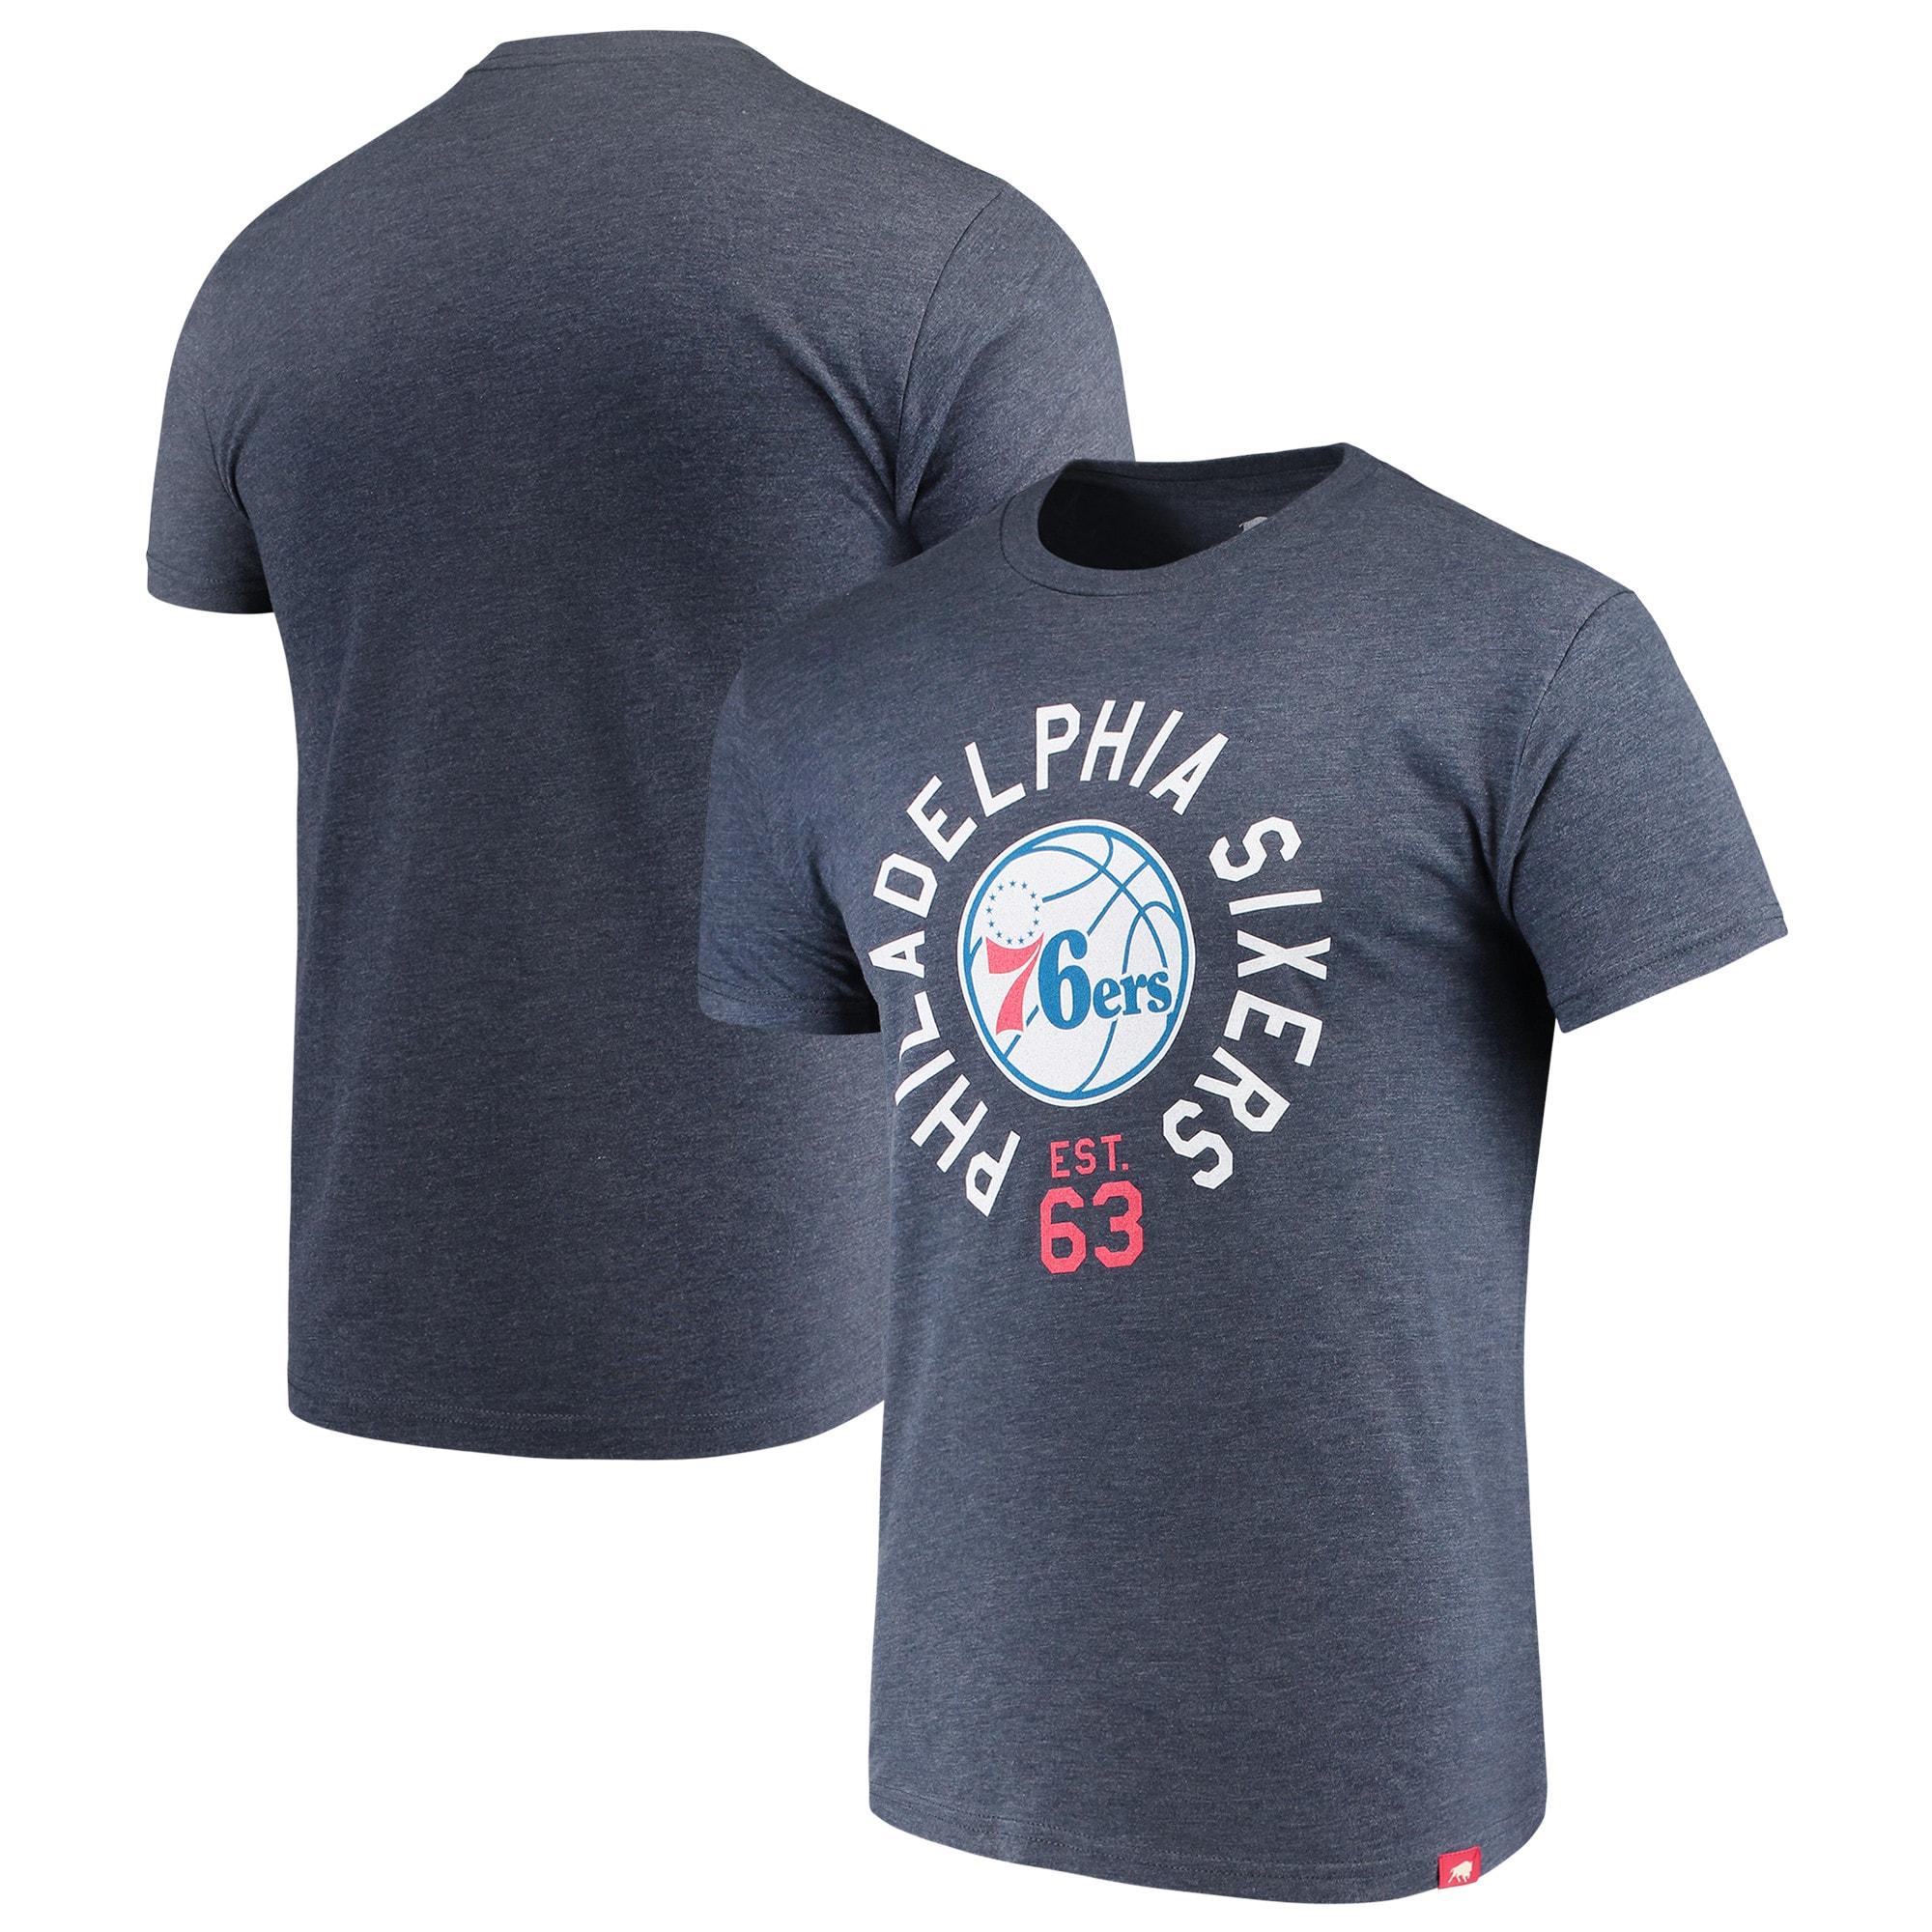 Philadelphia 76ers Sportiqe Comfy Super Soft Tri-Blend T-Shirt - Navy